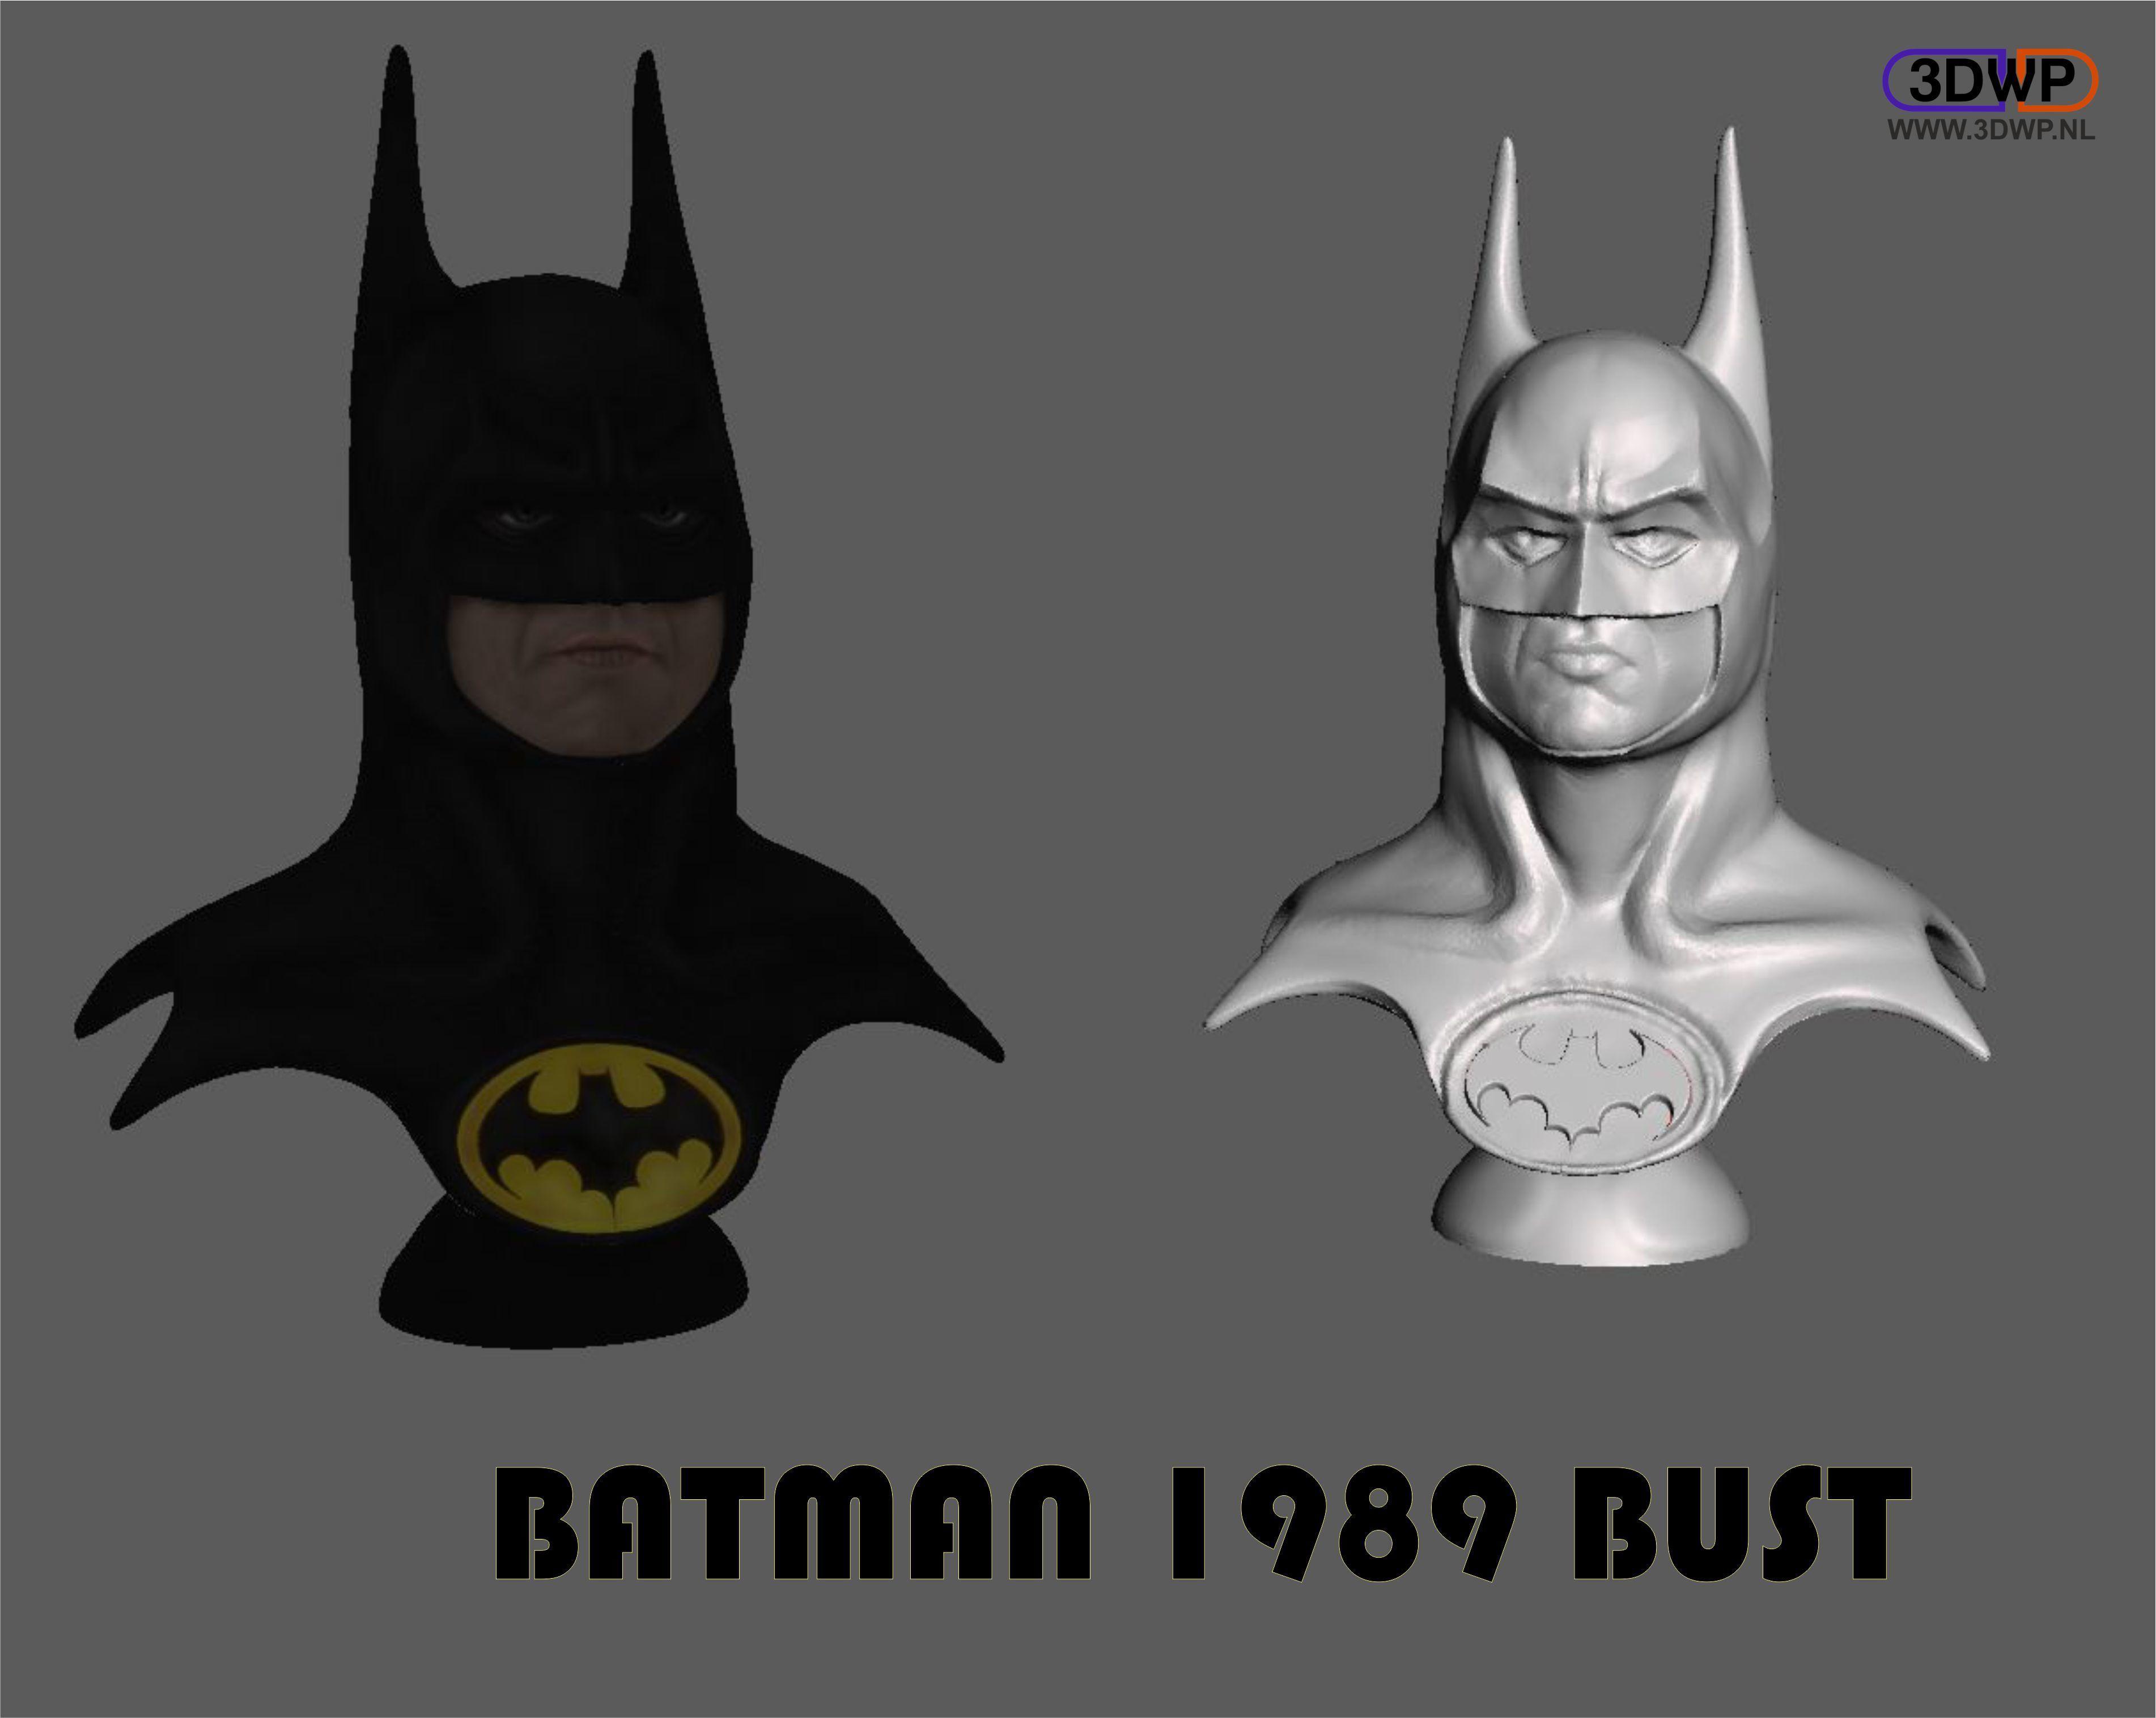 Batman_1989.JPG Download STL file Batman 1989 Bust (Michael Keaton) • 3D printable object, 3DWP